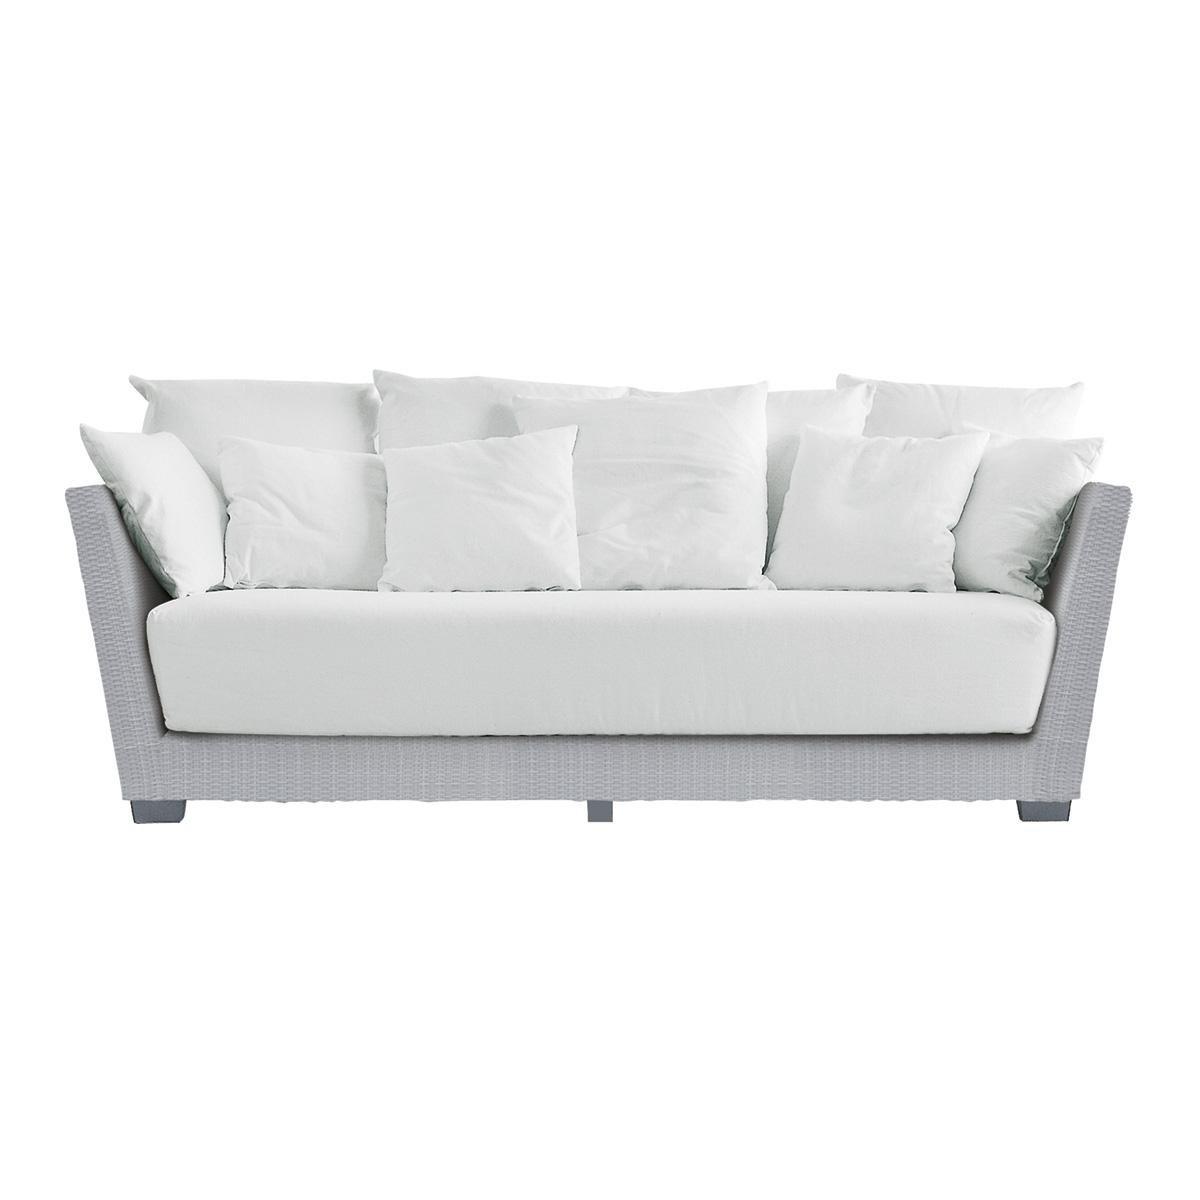 gervasoni inout 503 poly rattan outdoor sofa ambientedirect rh ambientedirect com